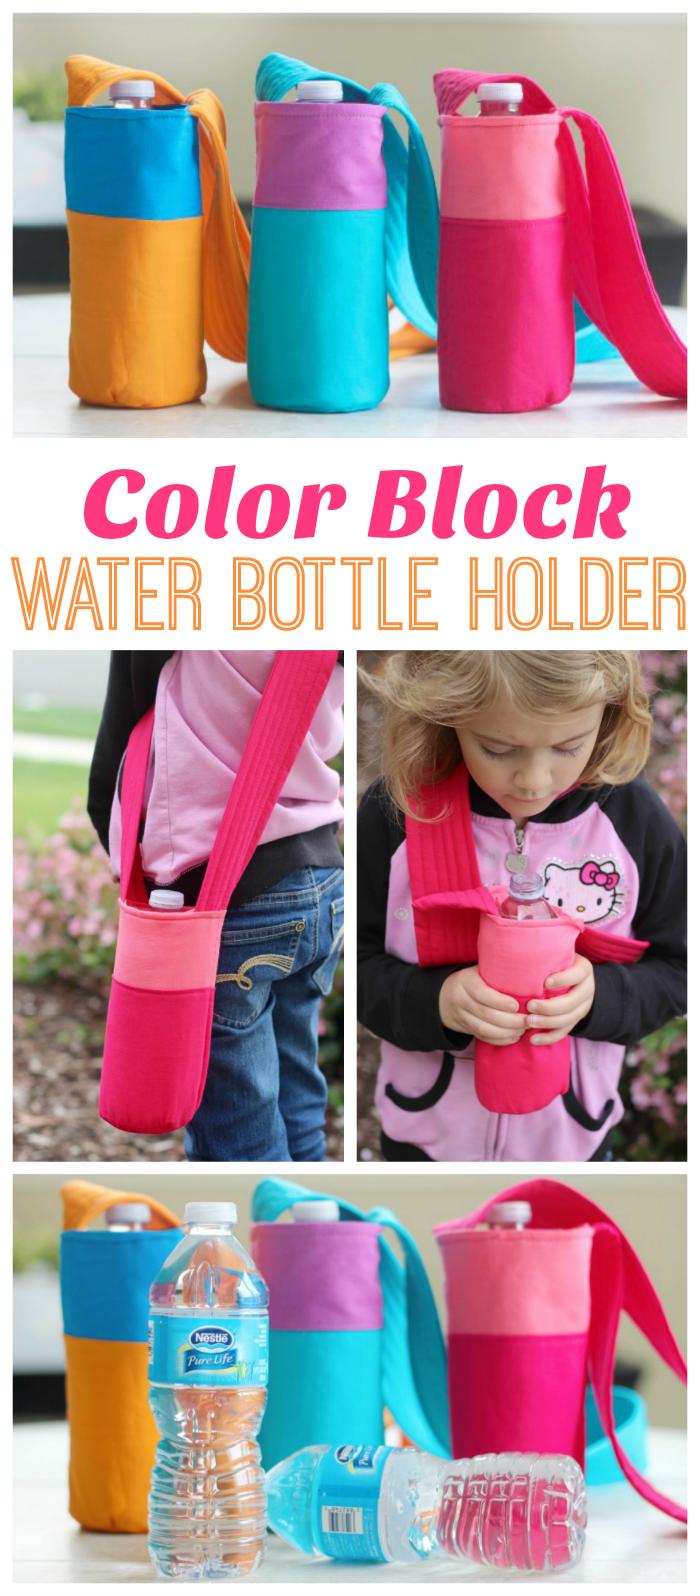 Color Block Fabric Water Bottle Holder Tutorial | Water ...